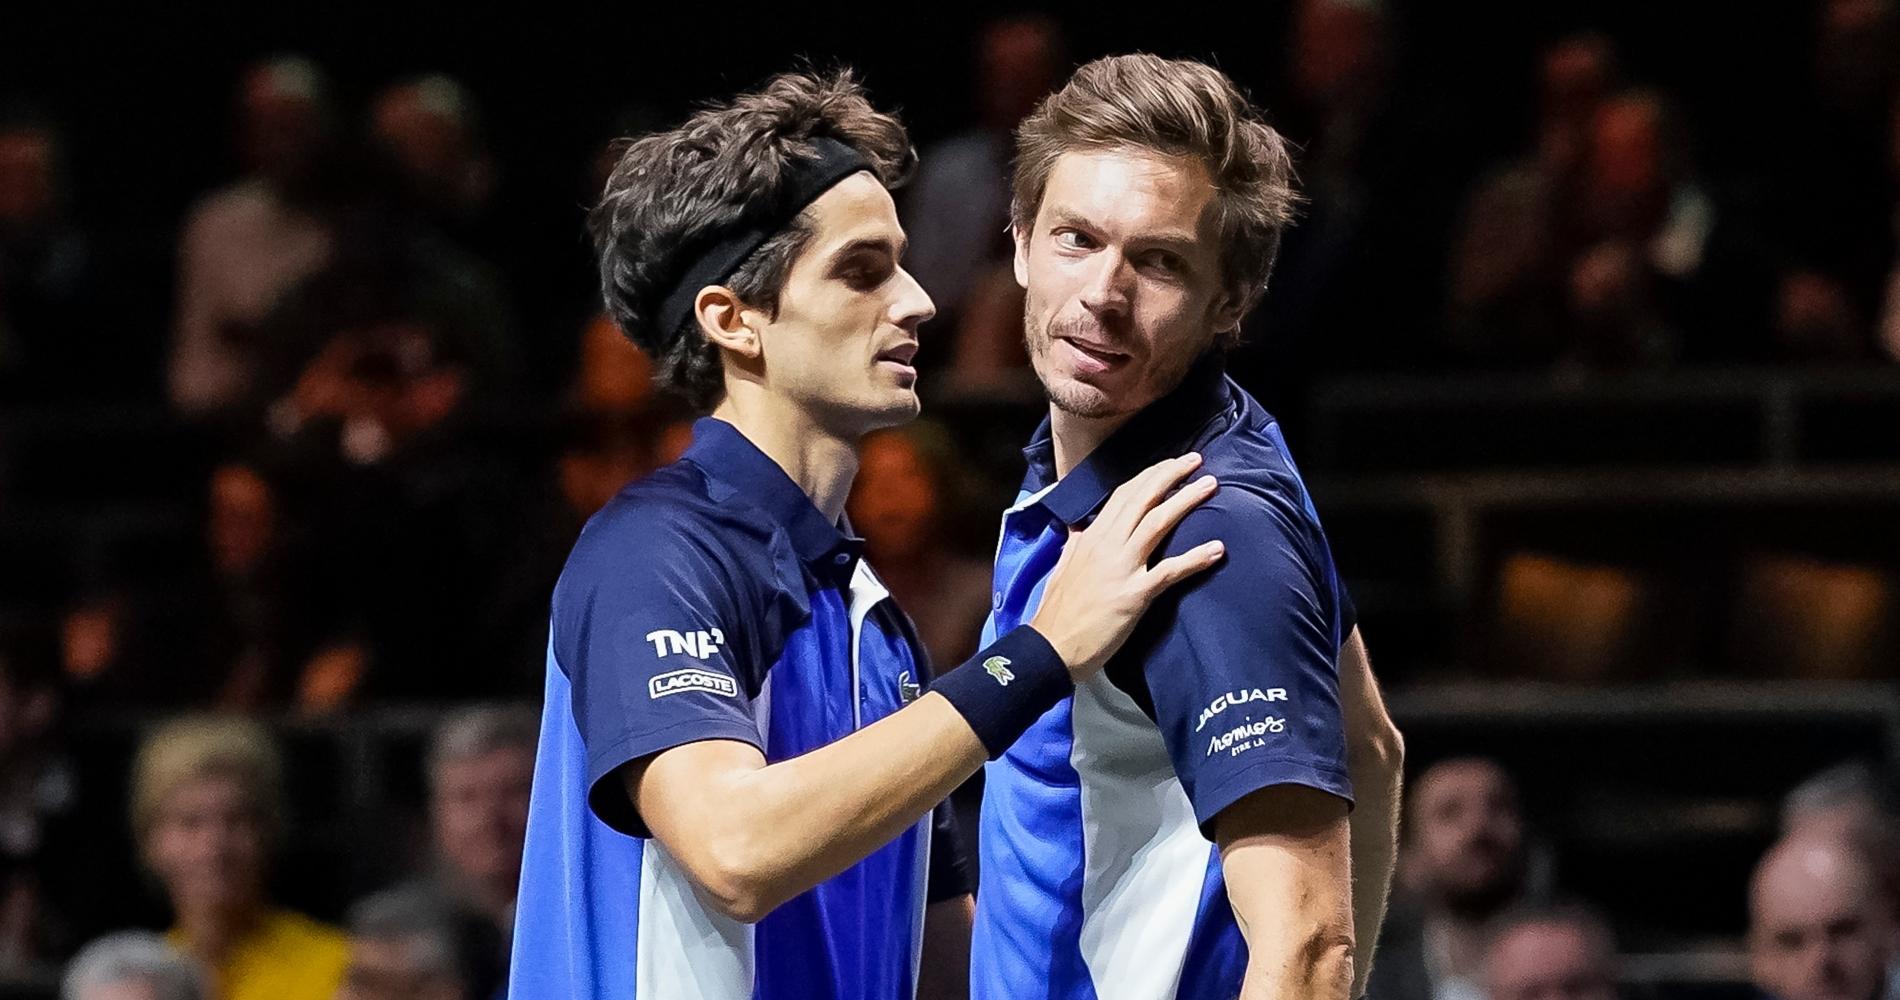 Pierre-Hugues Herbert and Nicolas Mahut, 2020 Rotterdam doubles' tournament